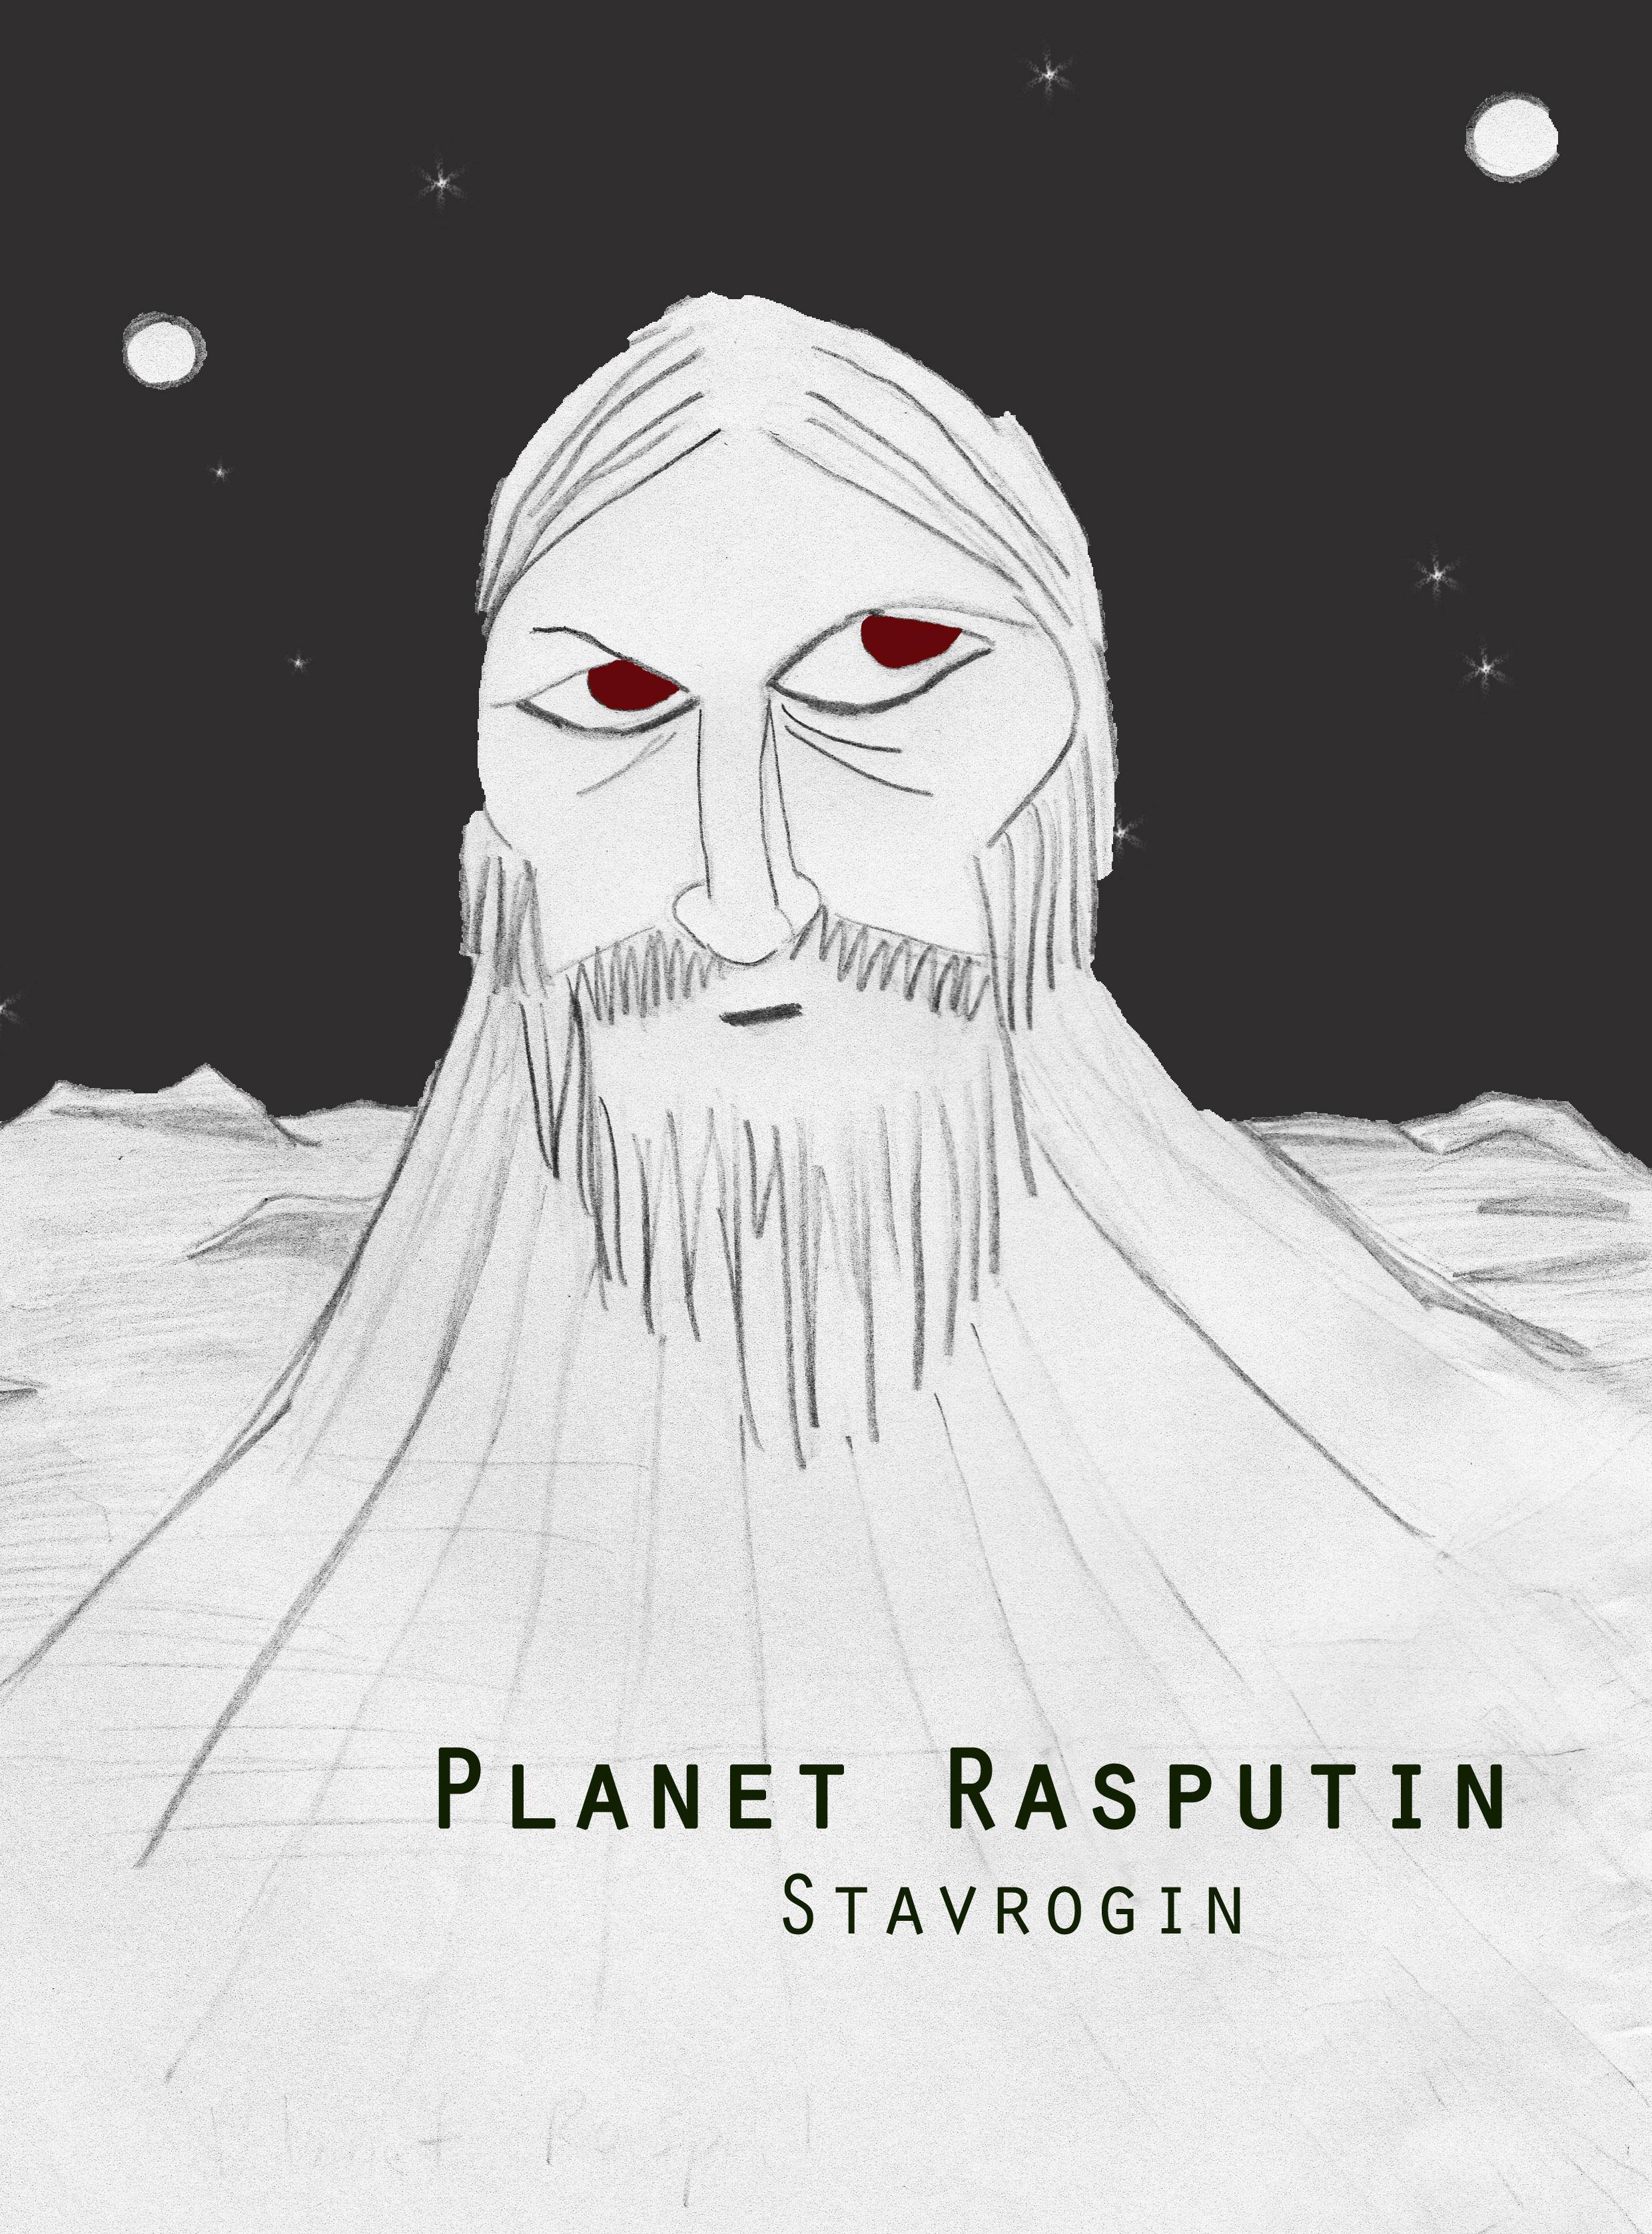 Planet Rasputin Oli Johns